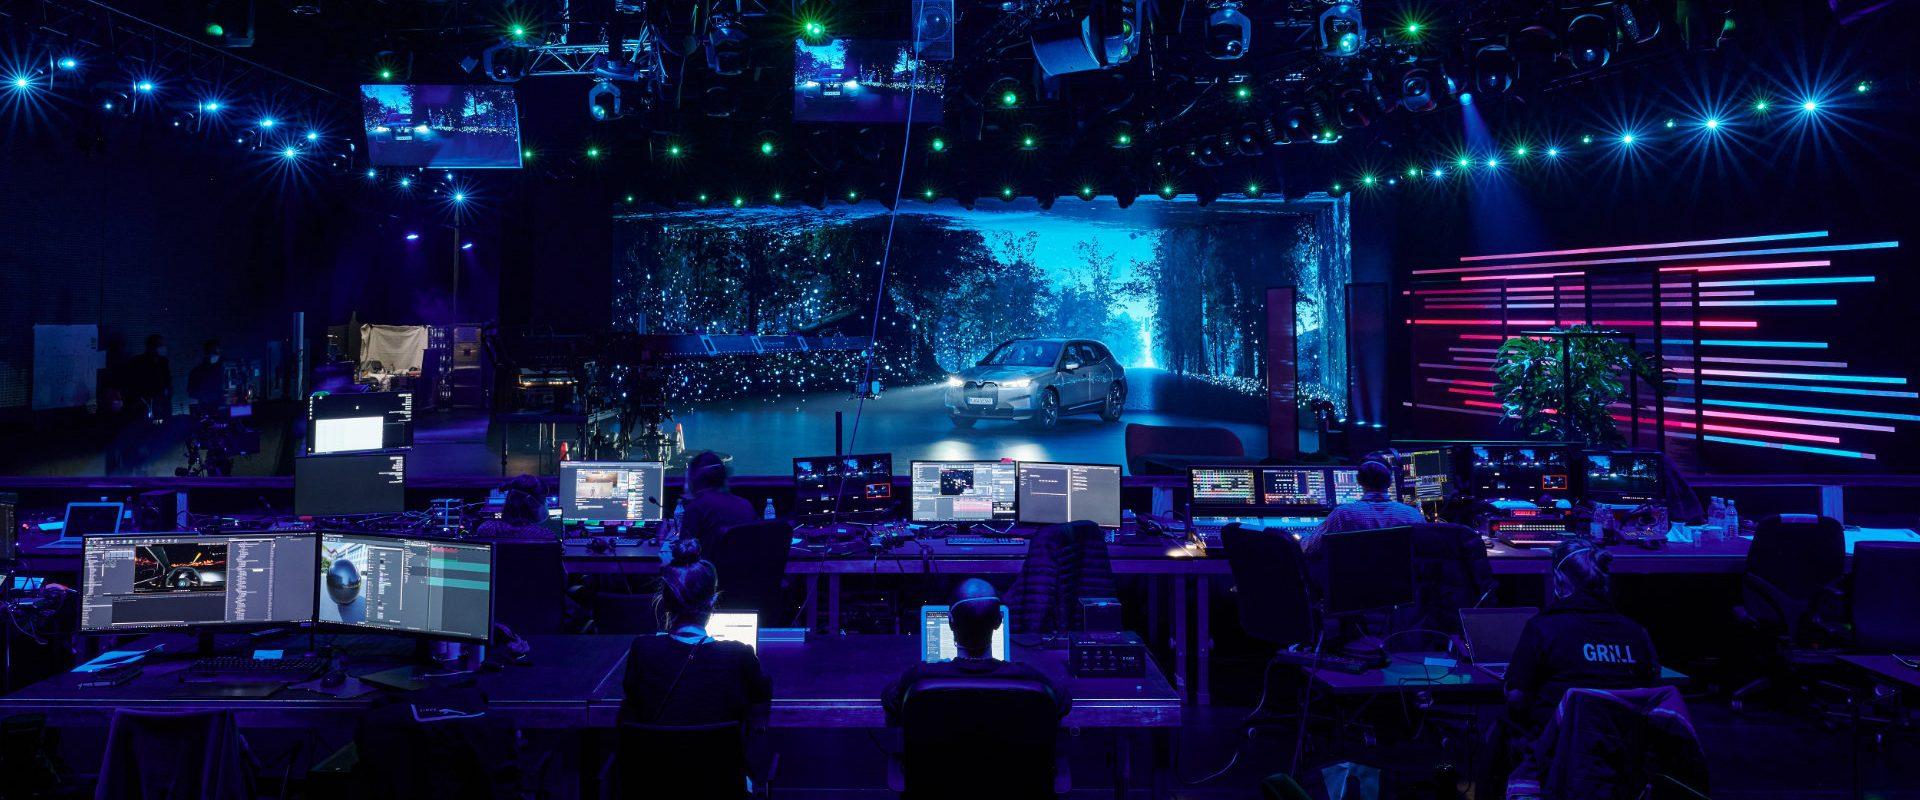 Elastique.: Virtual Production Cave MixedReality. BehindTheScenes. Photo: Manuel Nagel